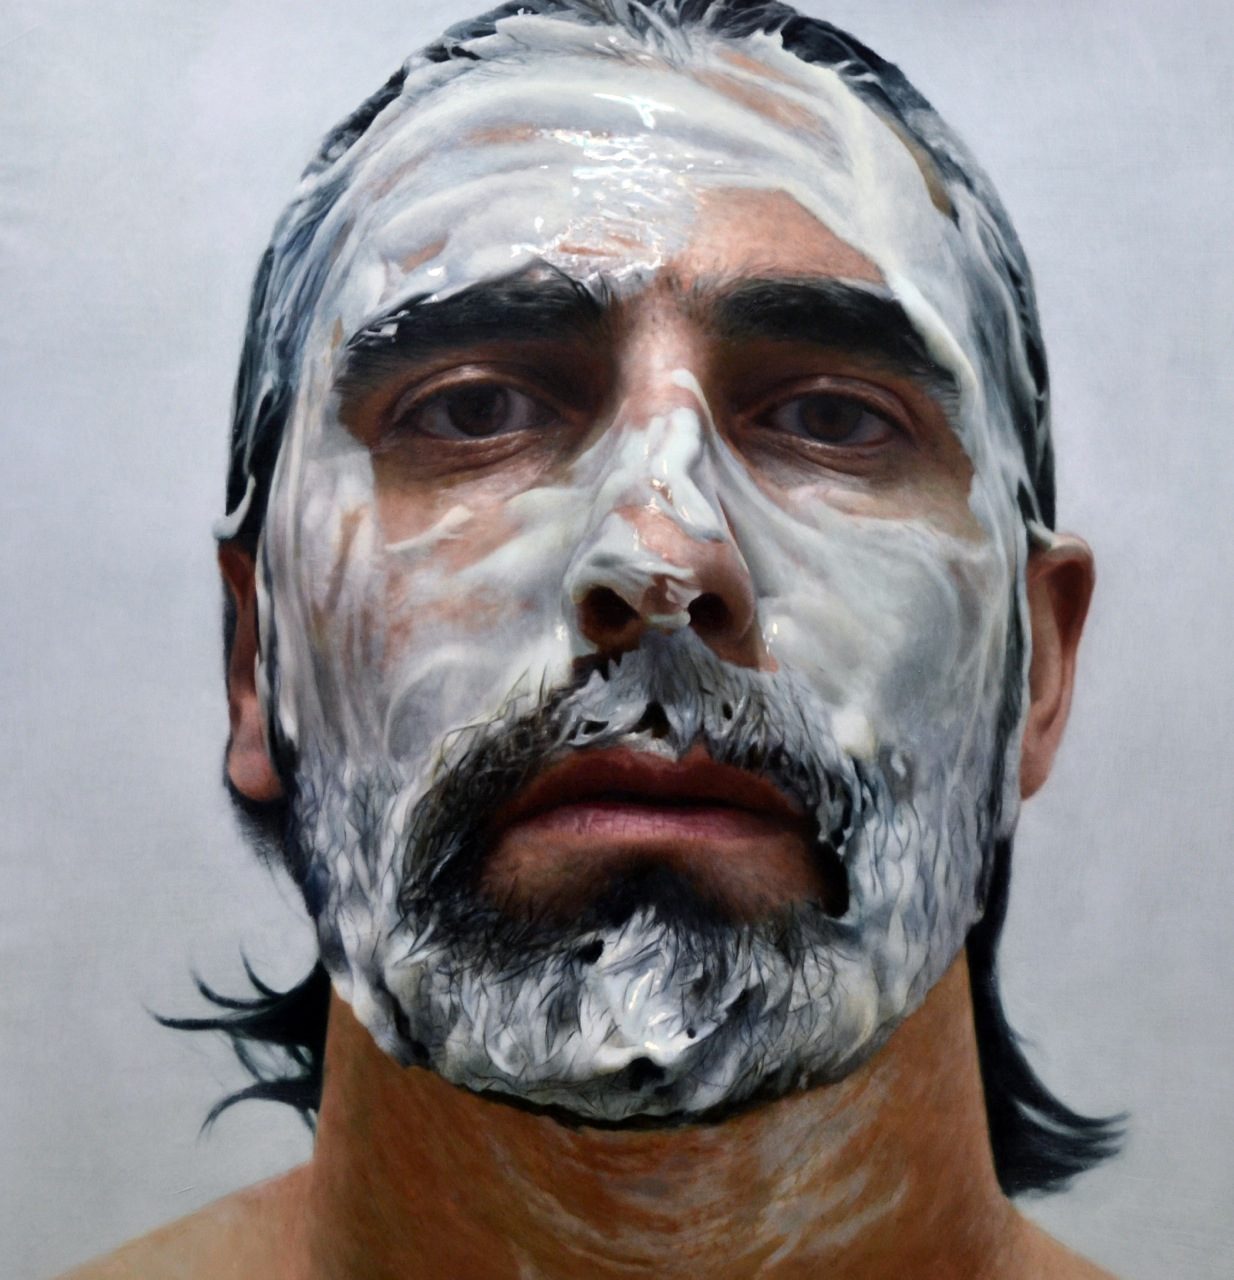 JLG_Eloy Morales_Paint in My Head number 10